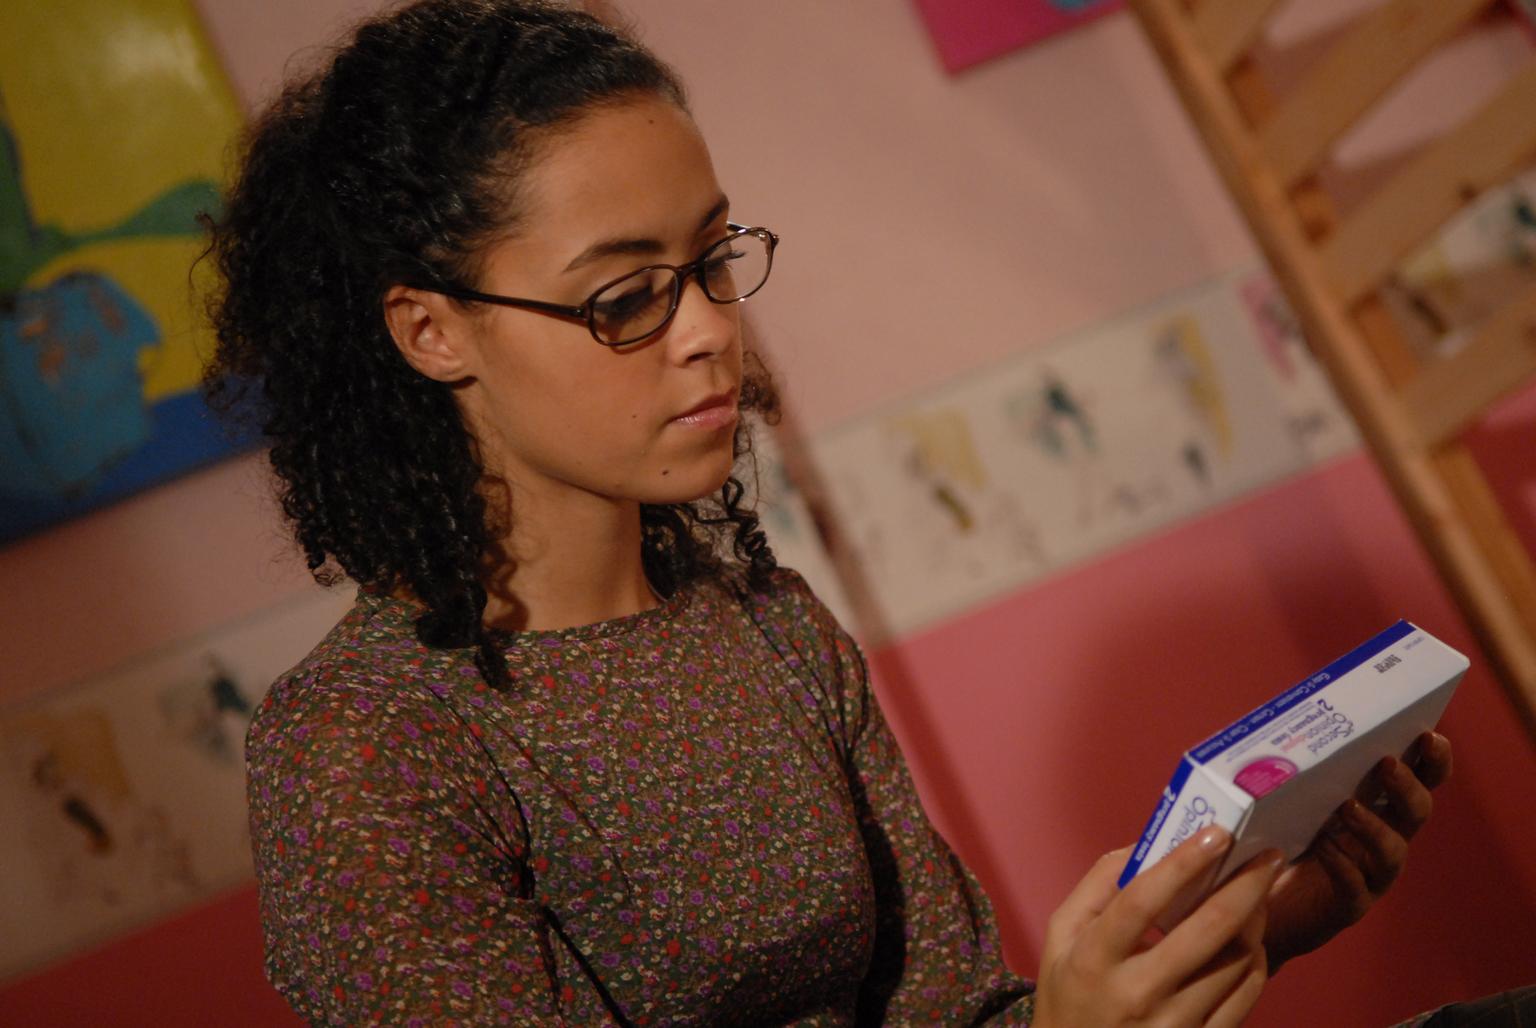 Will Tina take the pregnancy test?